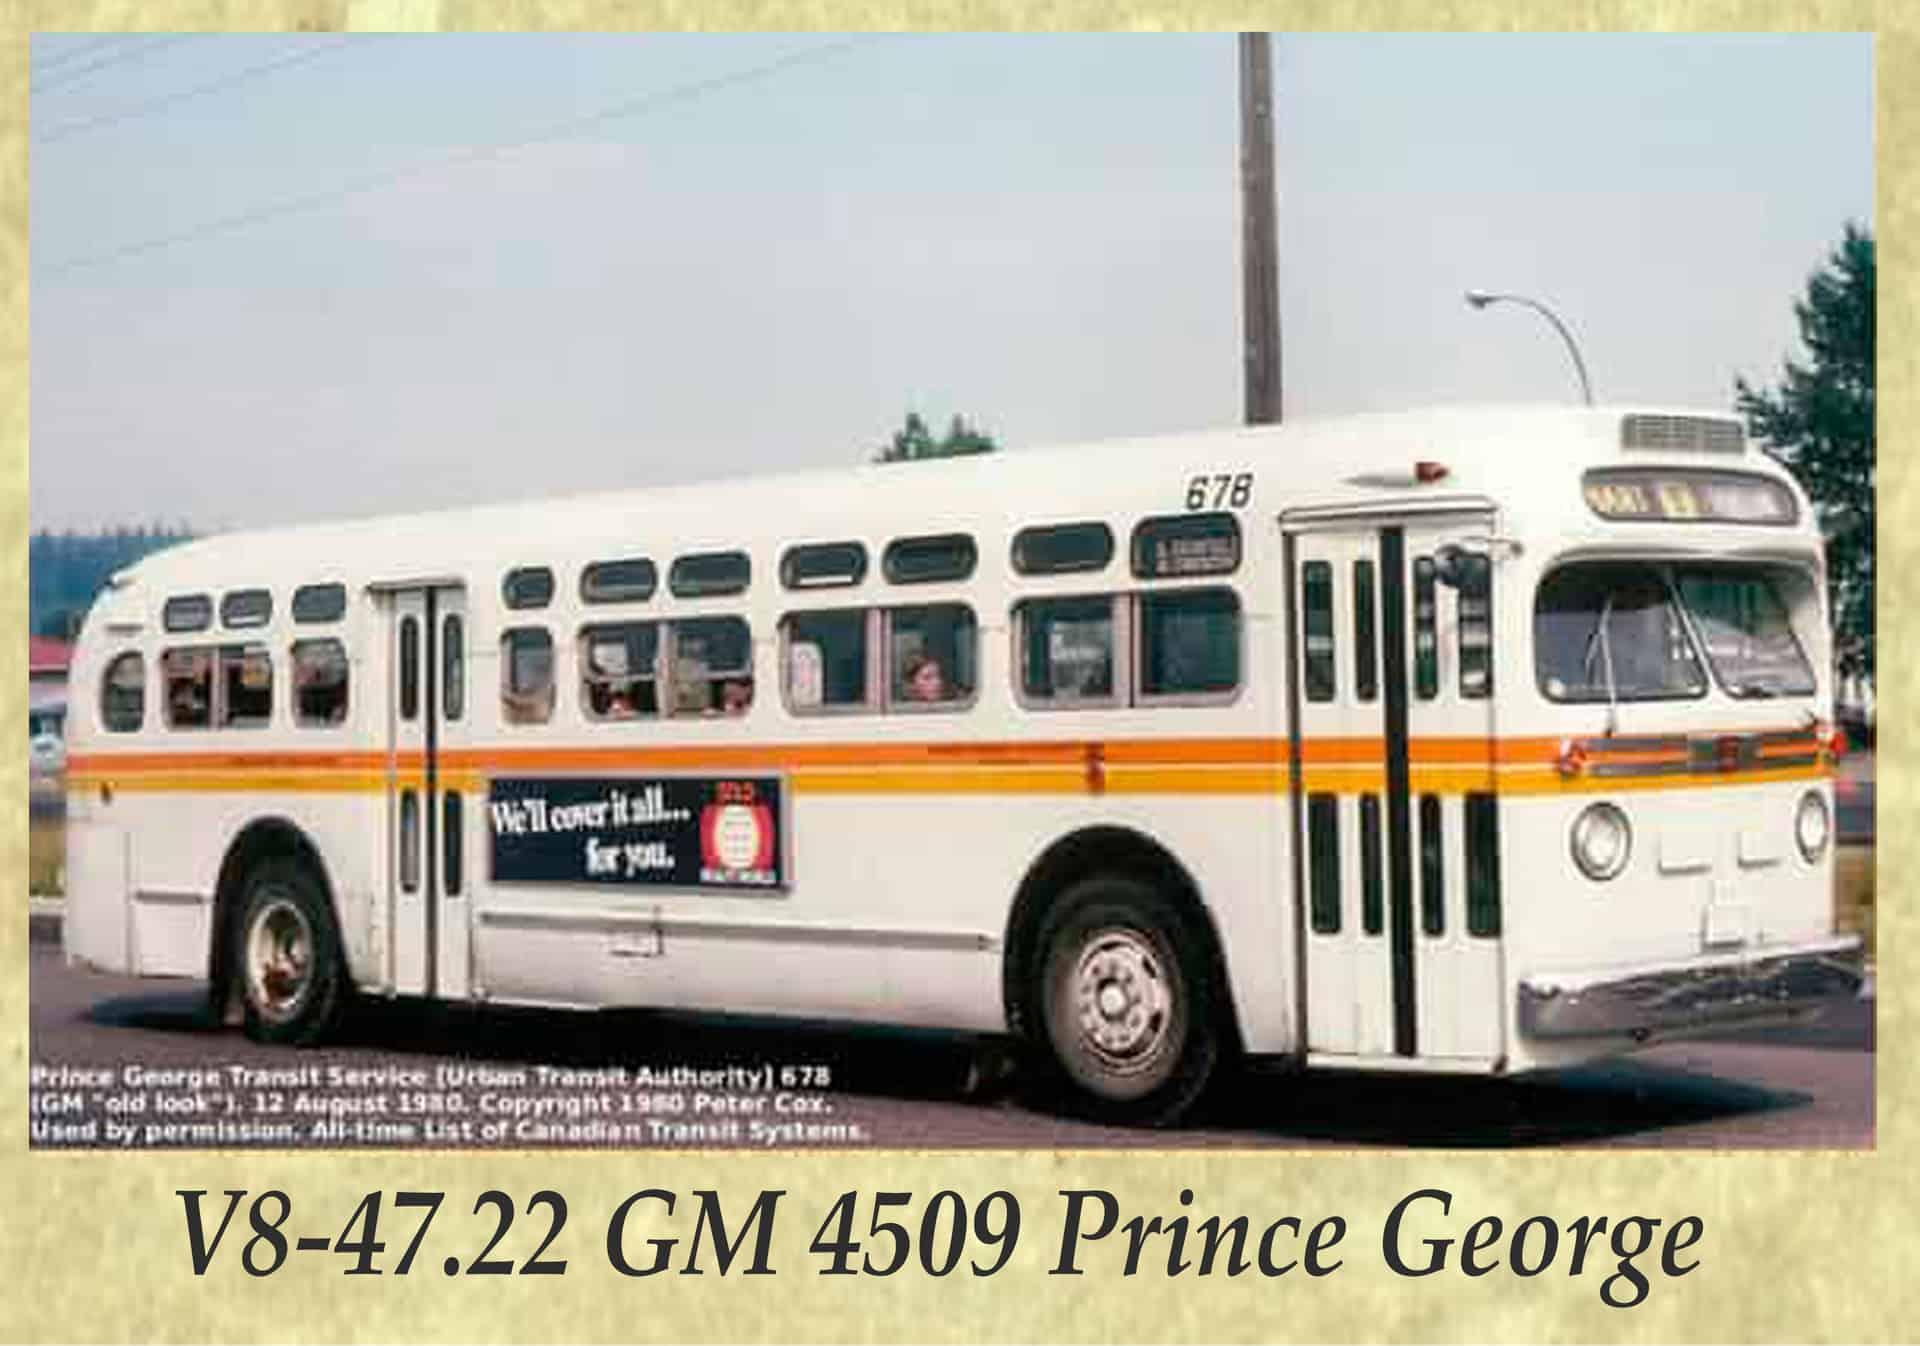 V8-47.22 GM 4509 Prince George